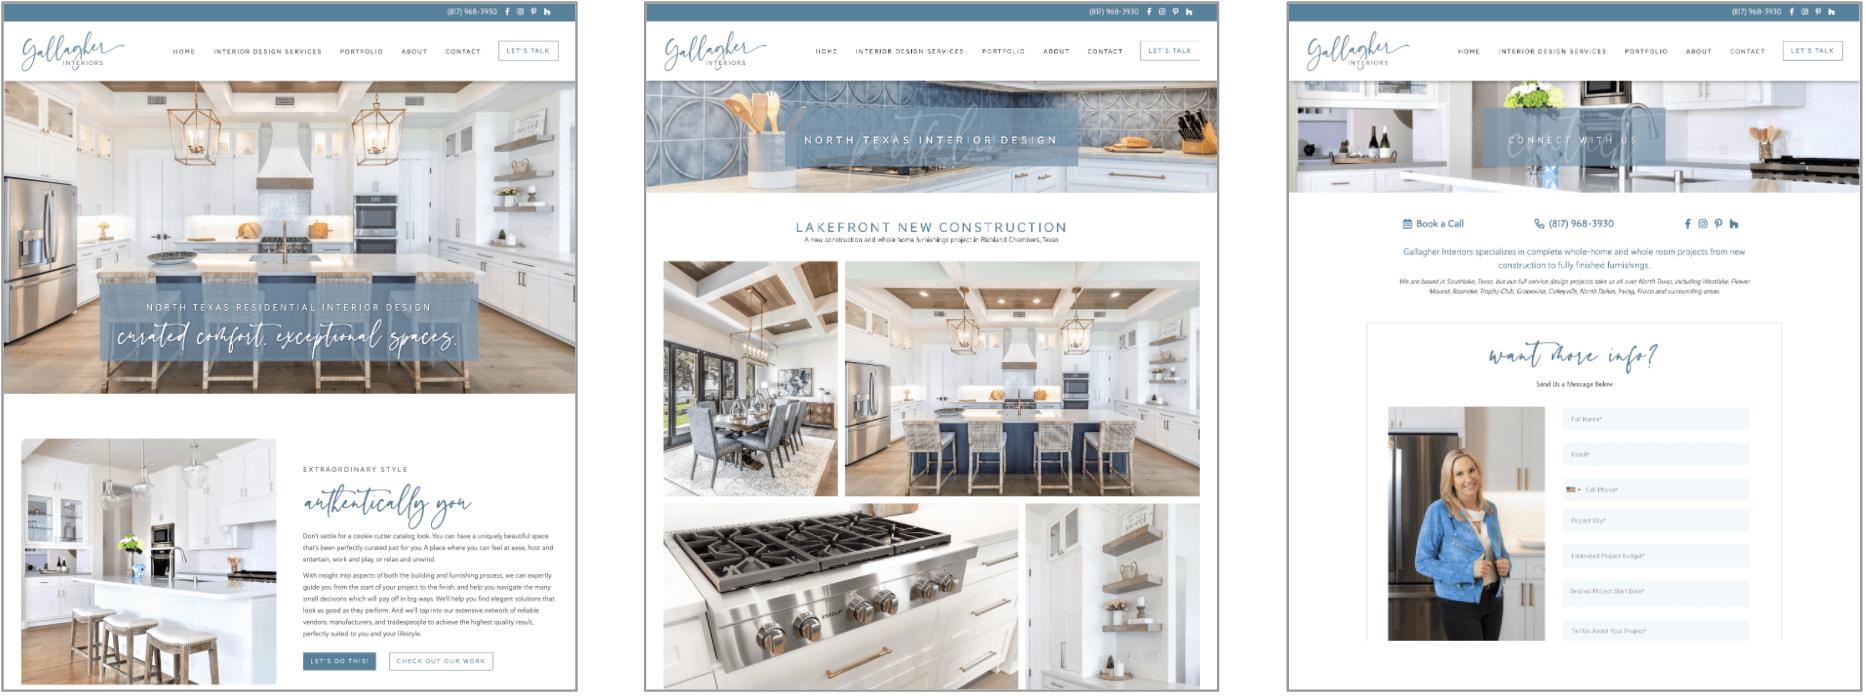 Gallagher Interiors Website After